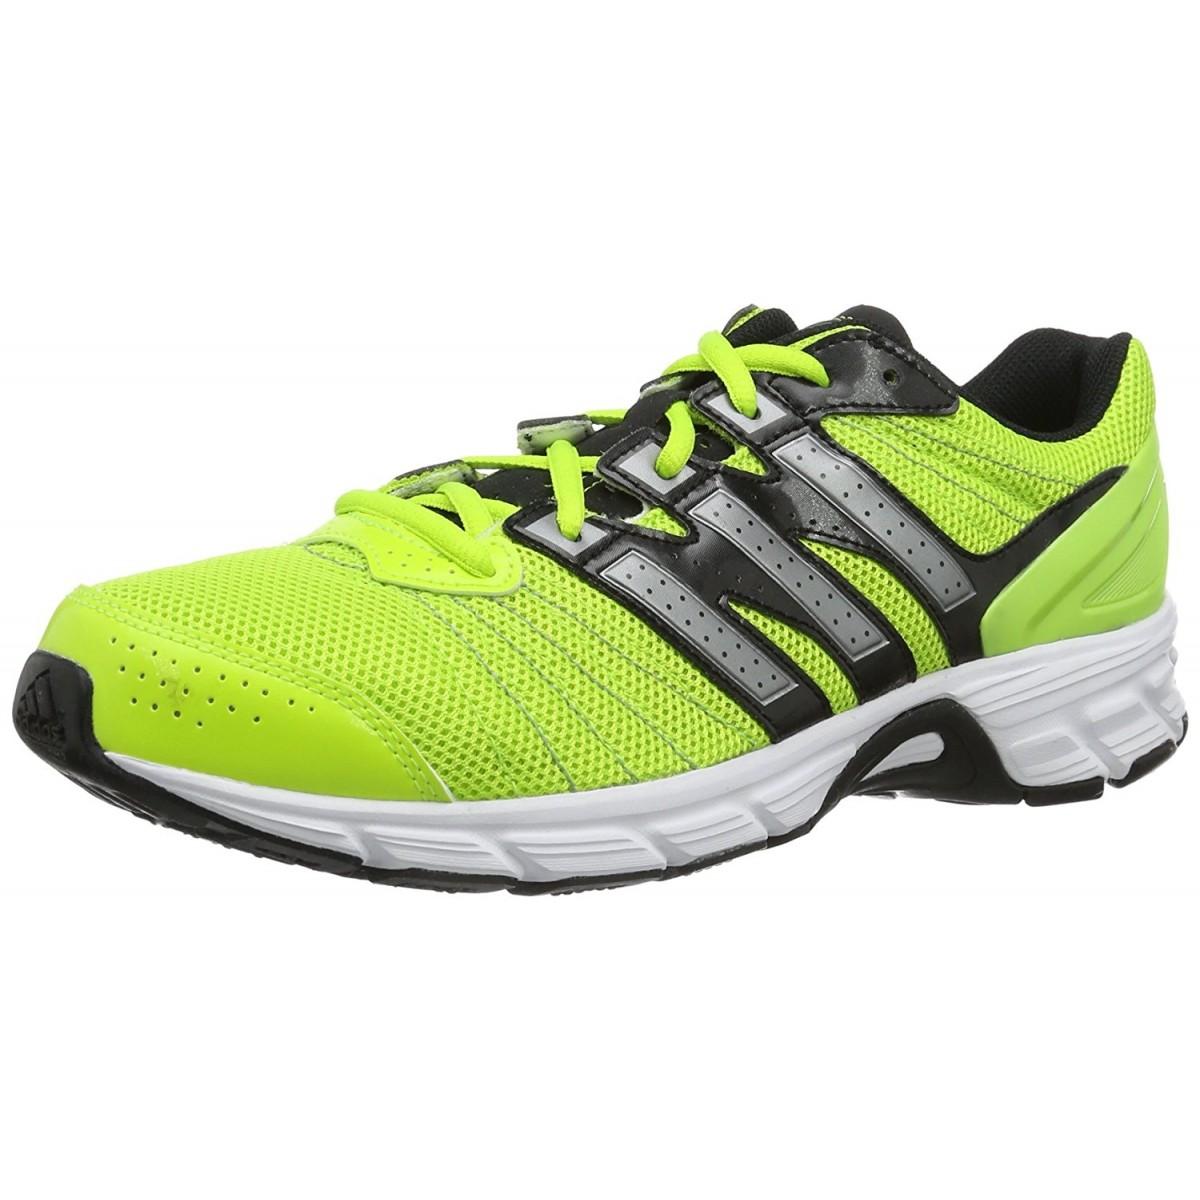 da4b015978 Tênis Masculino Adidas Roadmace Verde Preto - Compre Agora